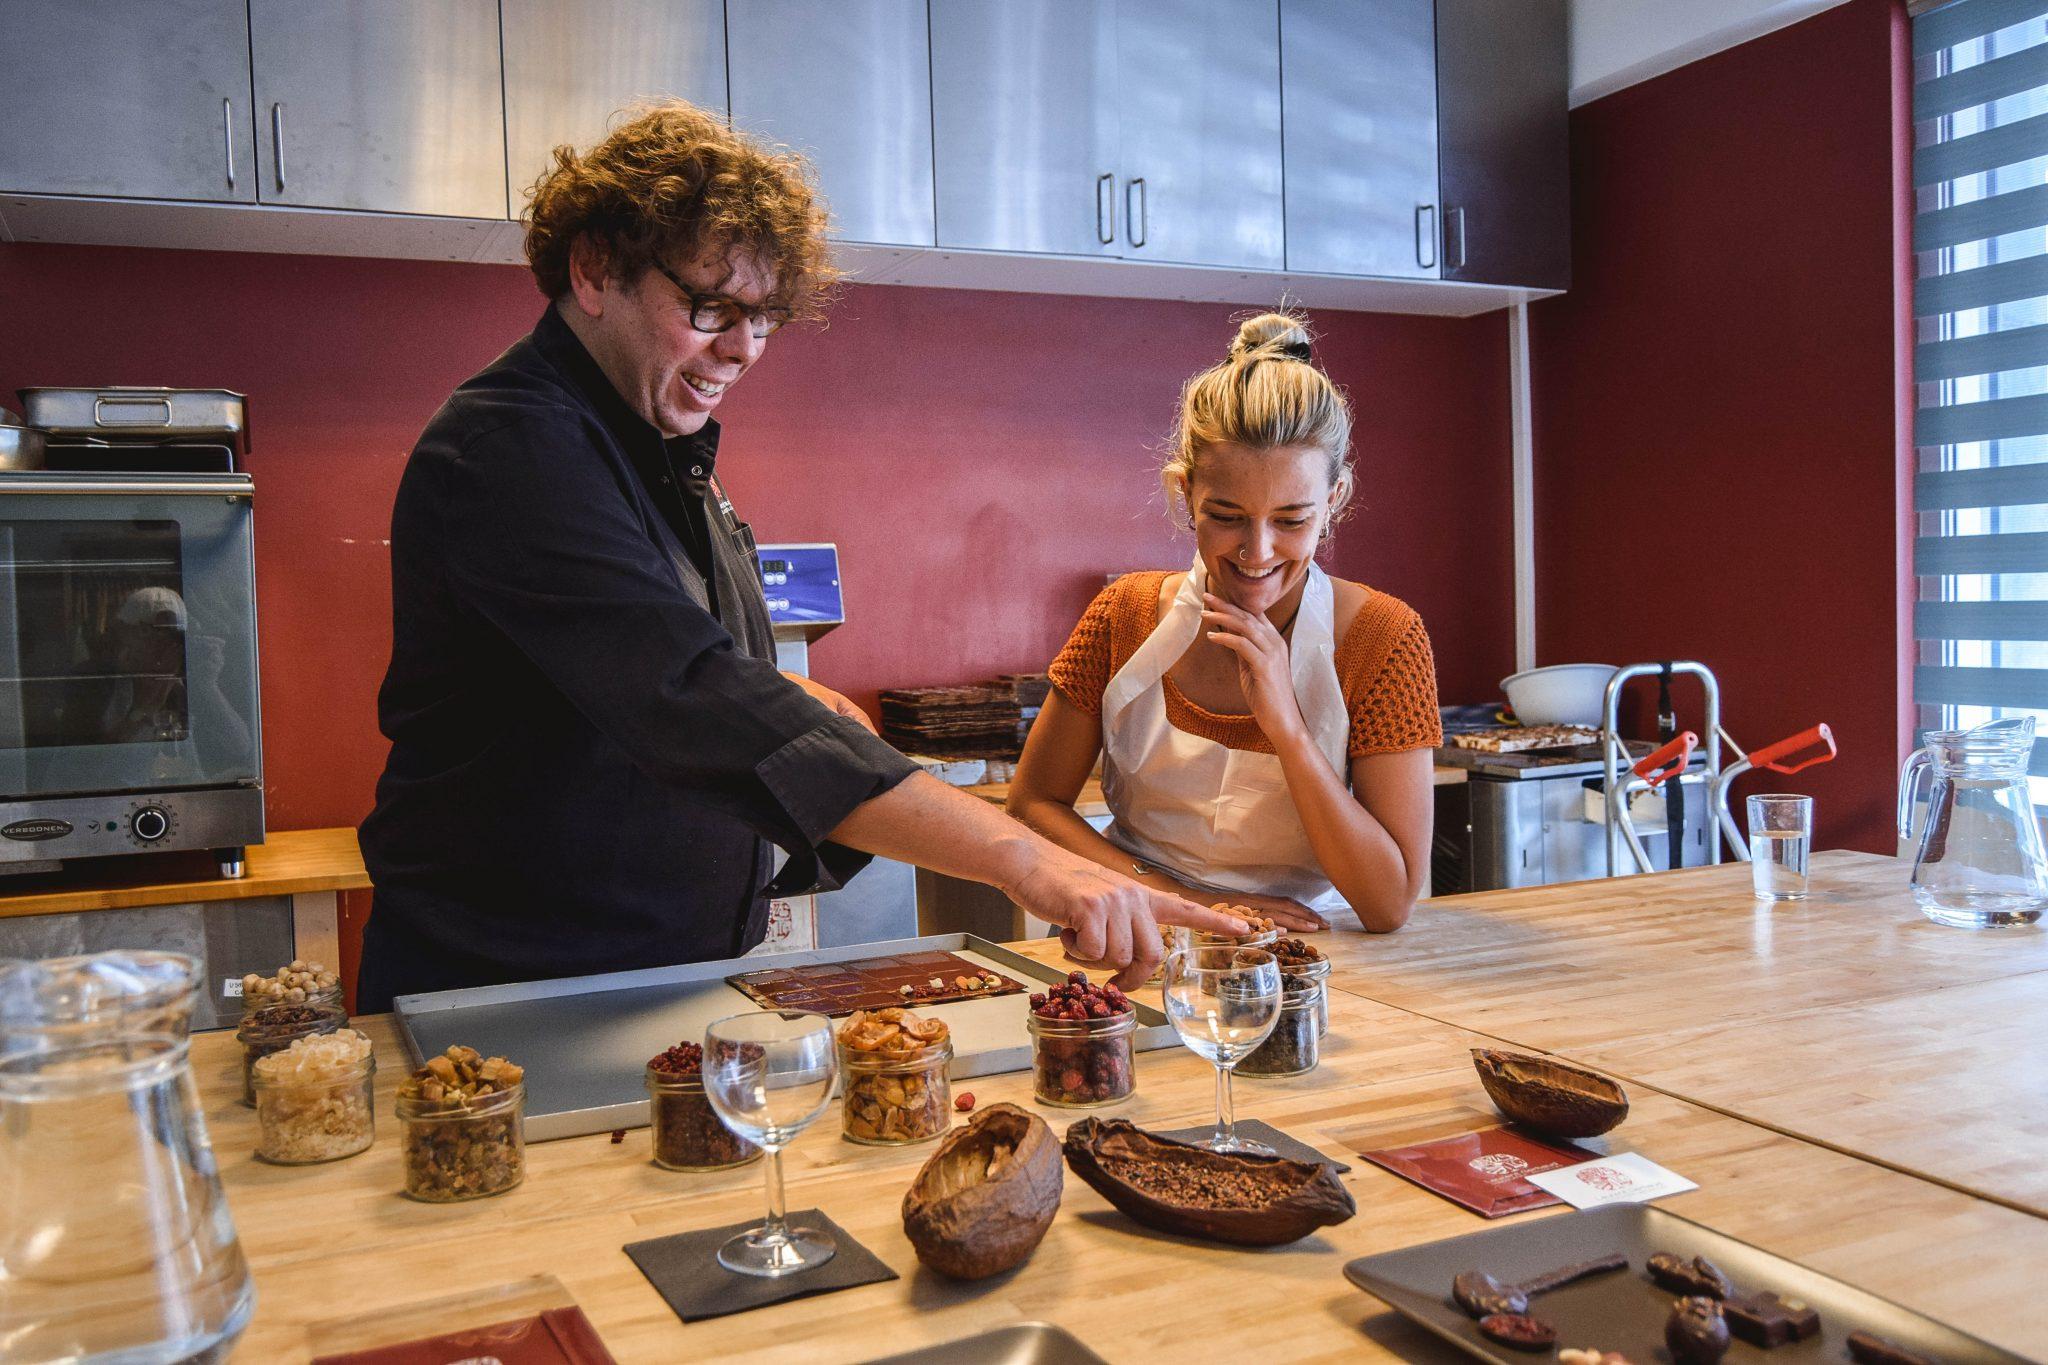 Wanderers & Warriors - Charlie & Lauren UK Travel Couple - Things To Do In Brussels In A Weekend - laurent gerbaud Chocolate Workshop Brussels